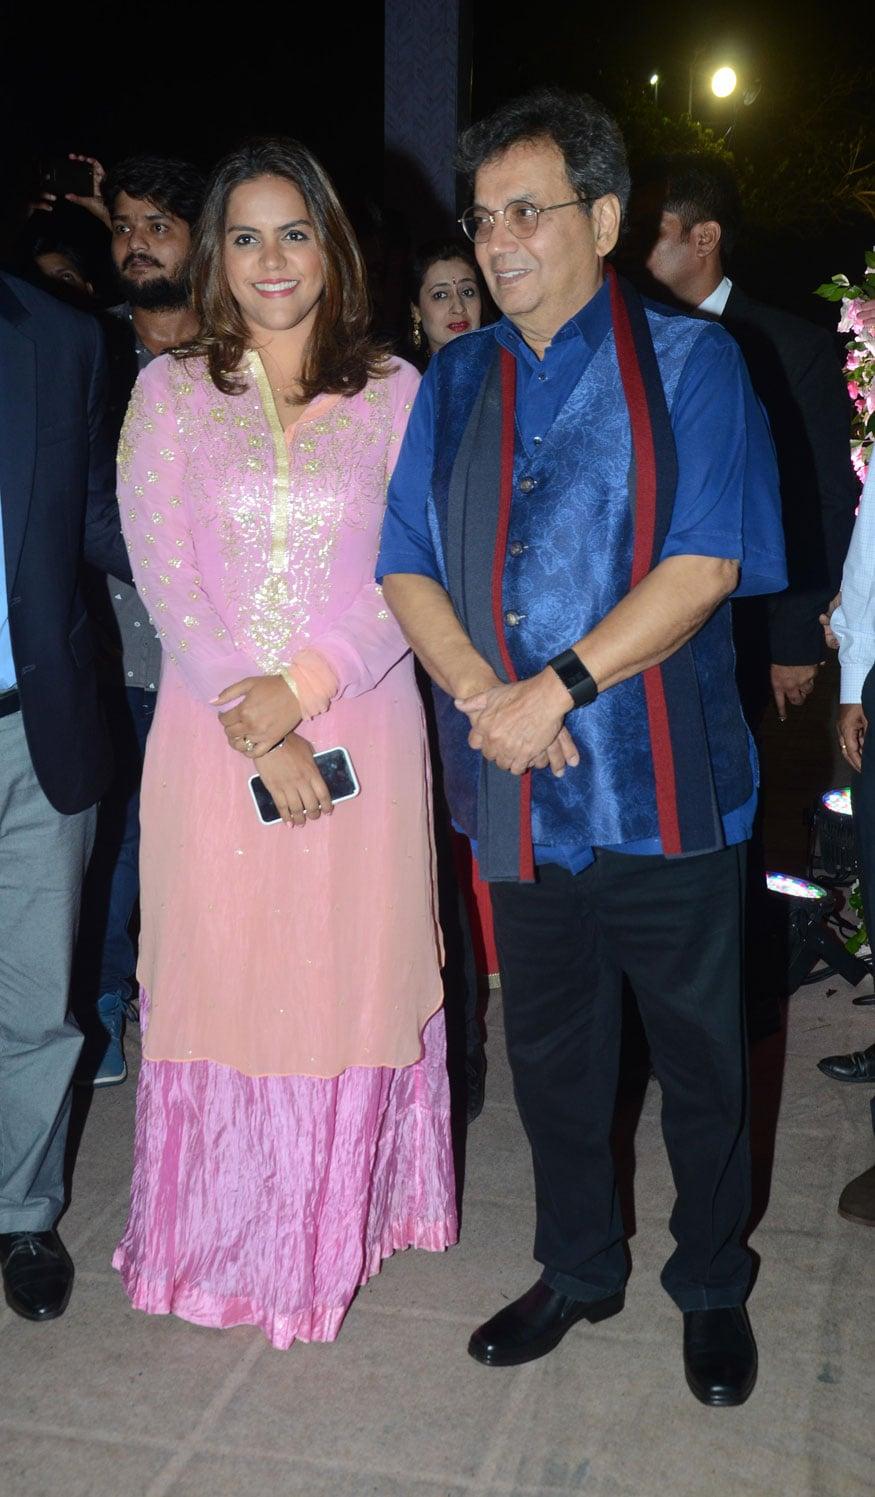 #MeToo: సుభాష్ ఘయ్పై కేట్ శర్మ సంచలన వ్యాఖ్యలు.. #MeToo: subhash ghai accused by television actress kate sharma..